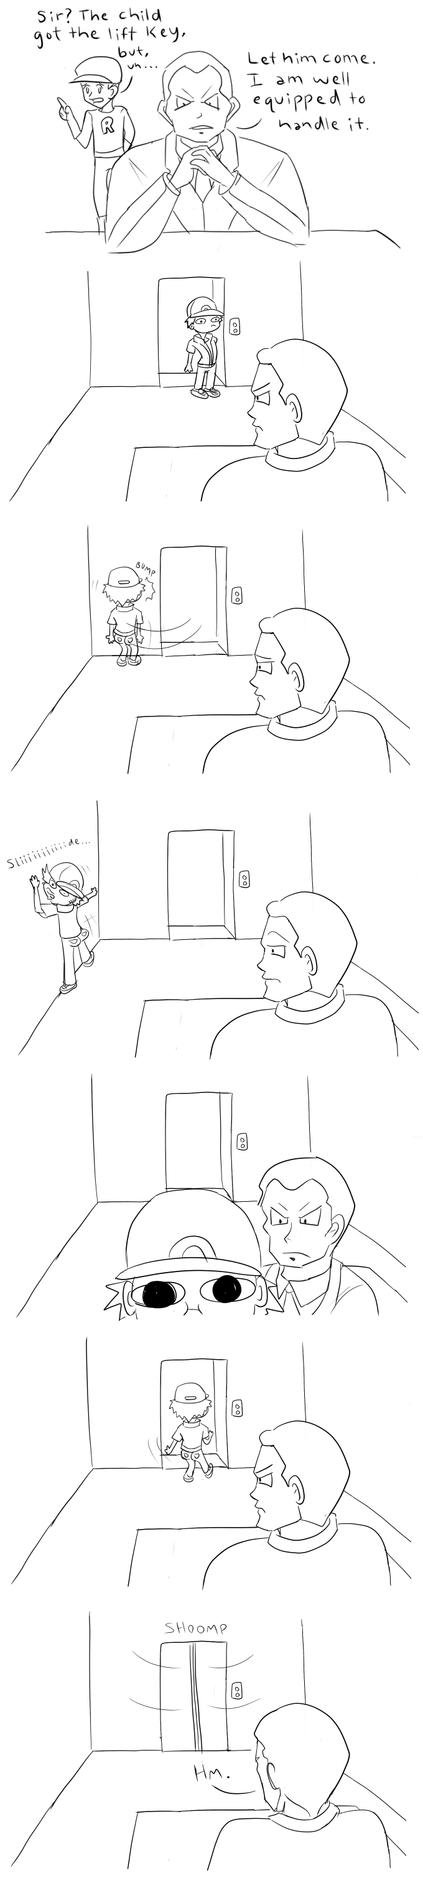 Twitch Plays Pokemon - Giovanni Encounter by KatRaccoon